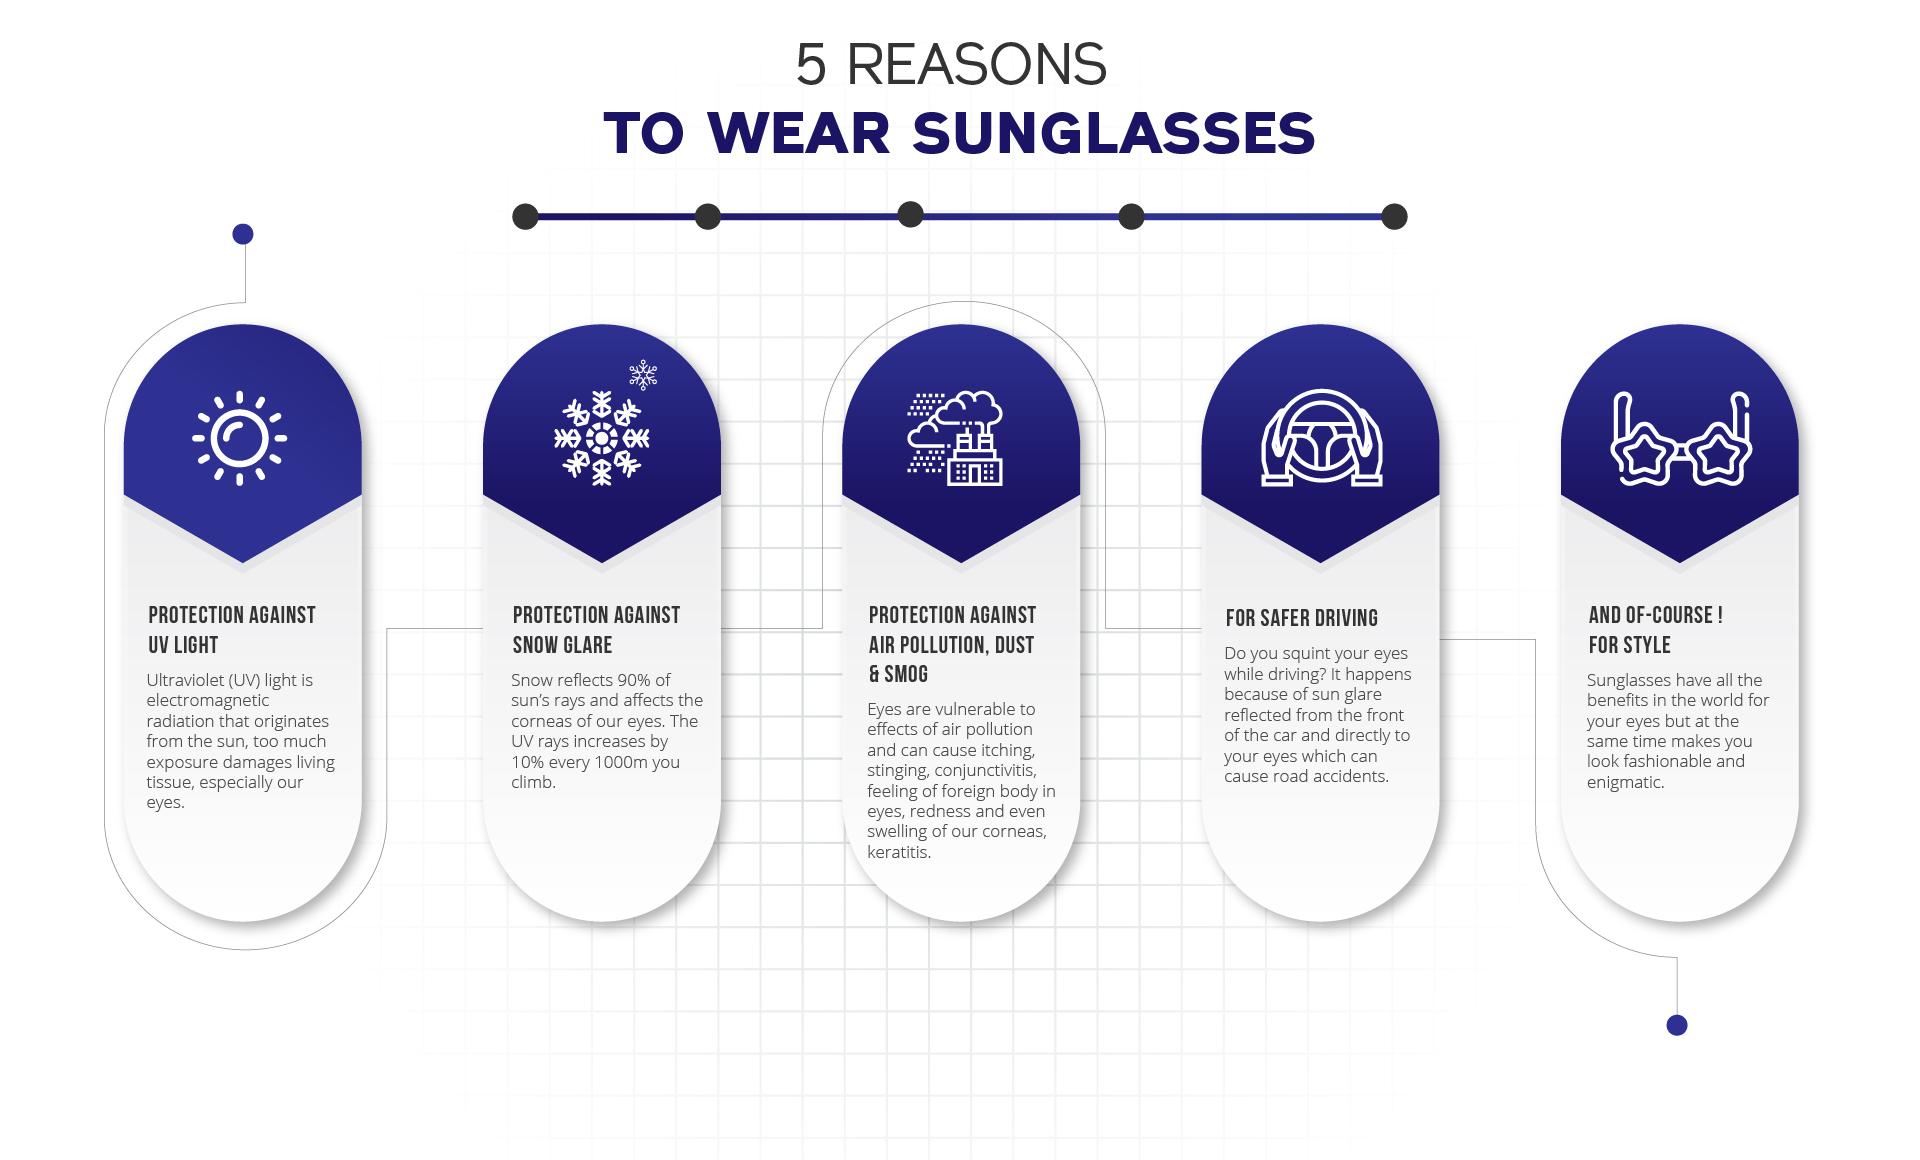 5 reasons to wear sunglasses